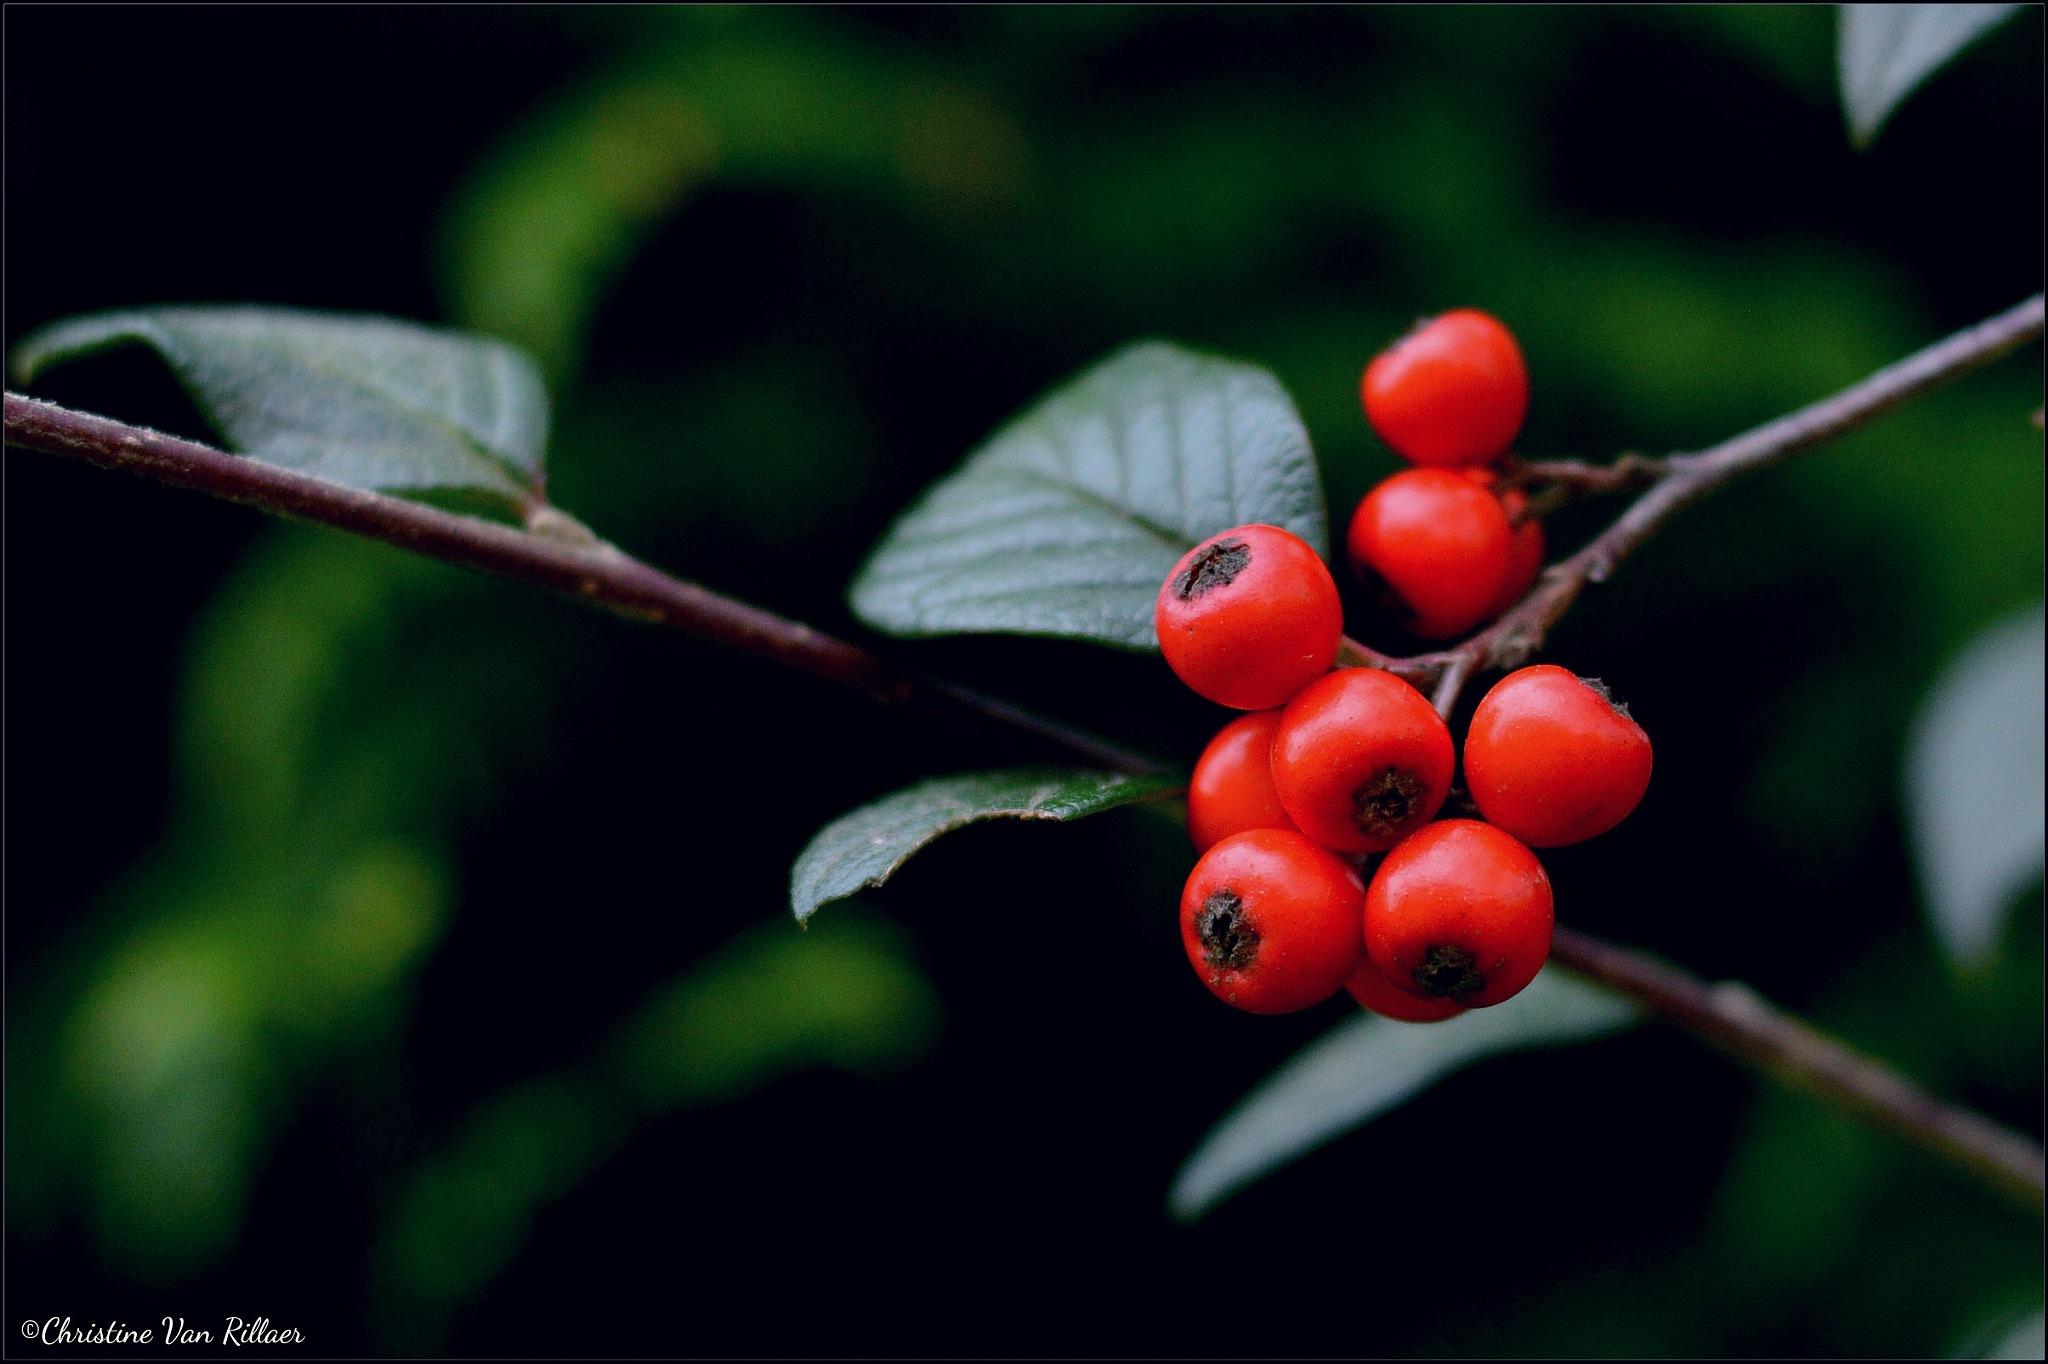 Autumn fruit by Chris